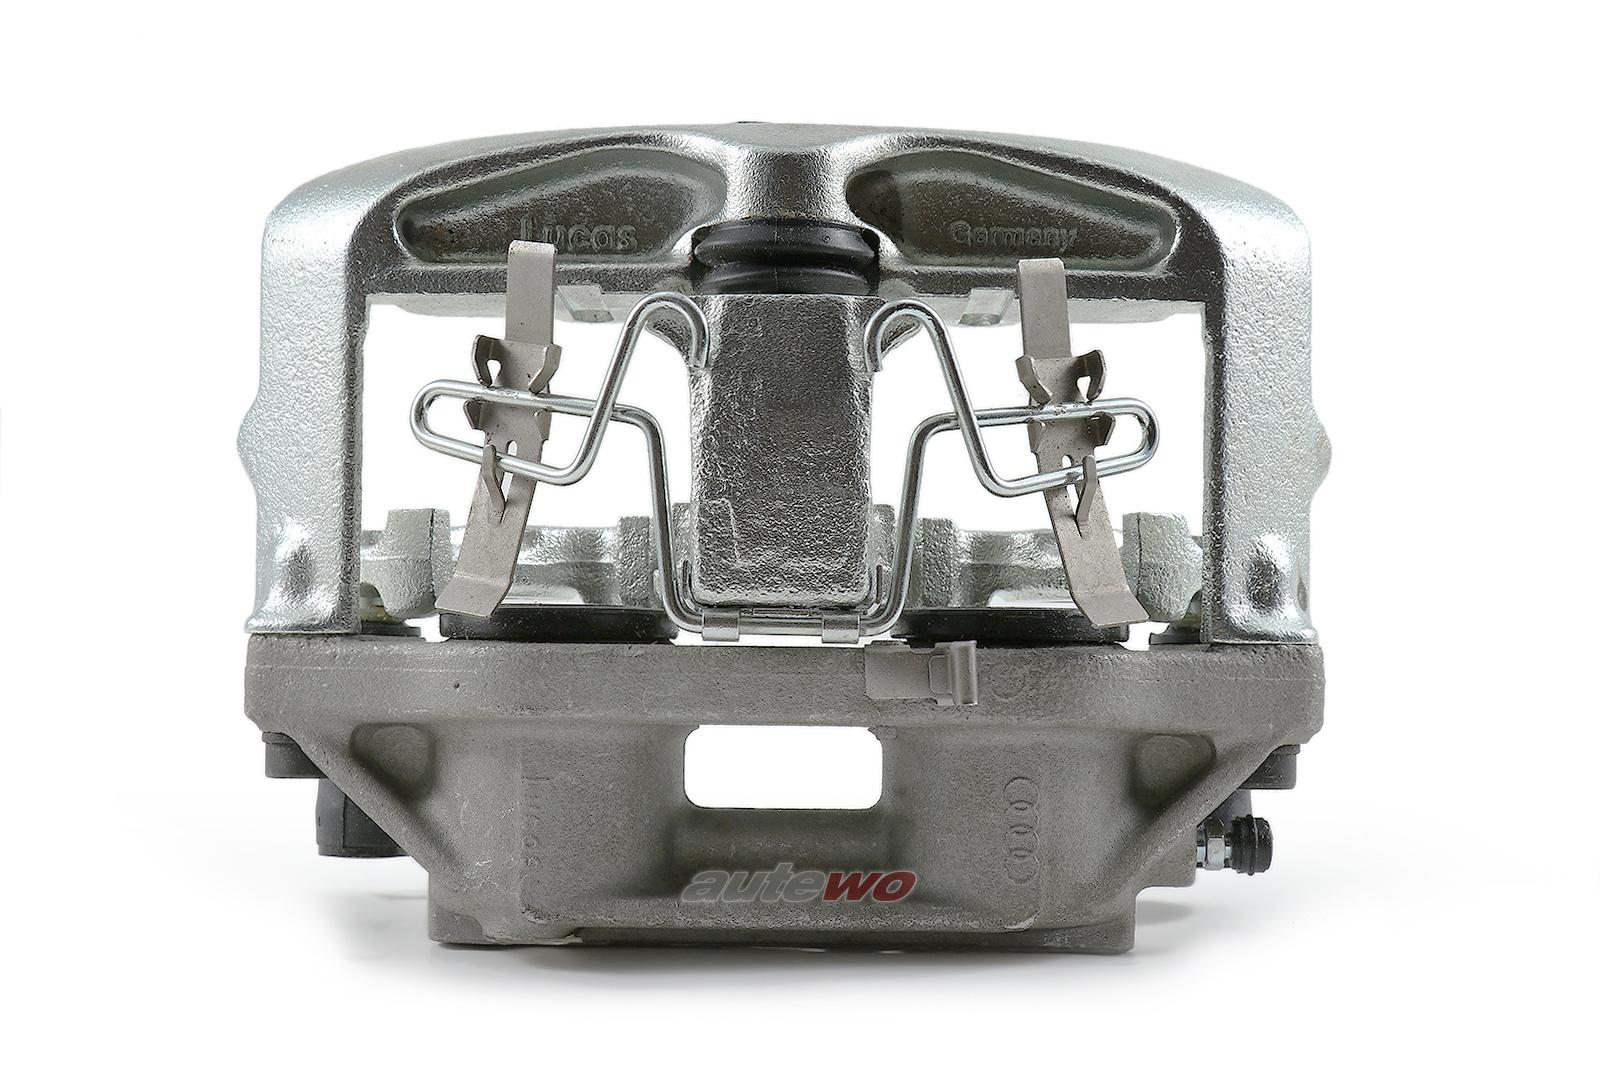 #4B0615107B Audi S4 B5/A6 4B/A8 D2 HP2 Bremssattel 323x30mm Vorne Links